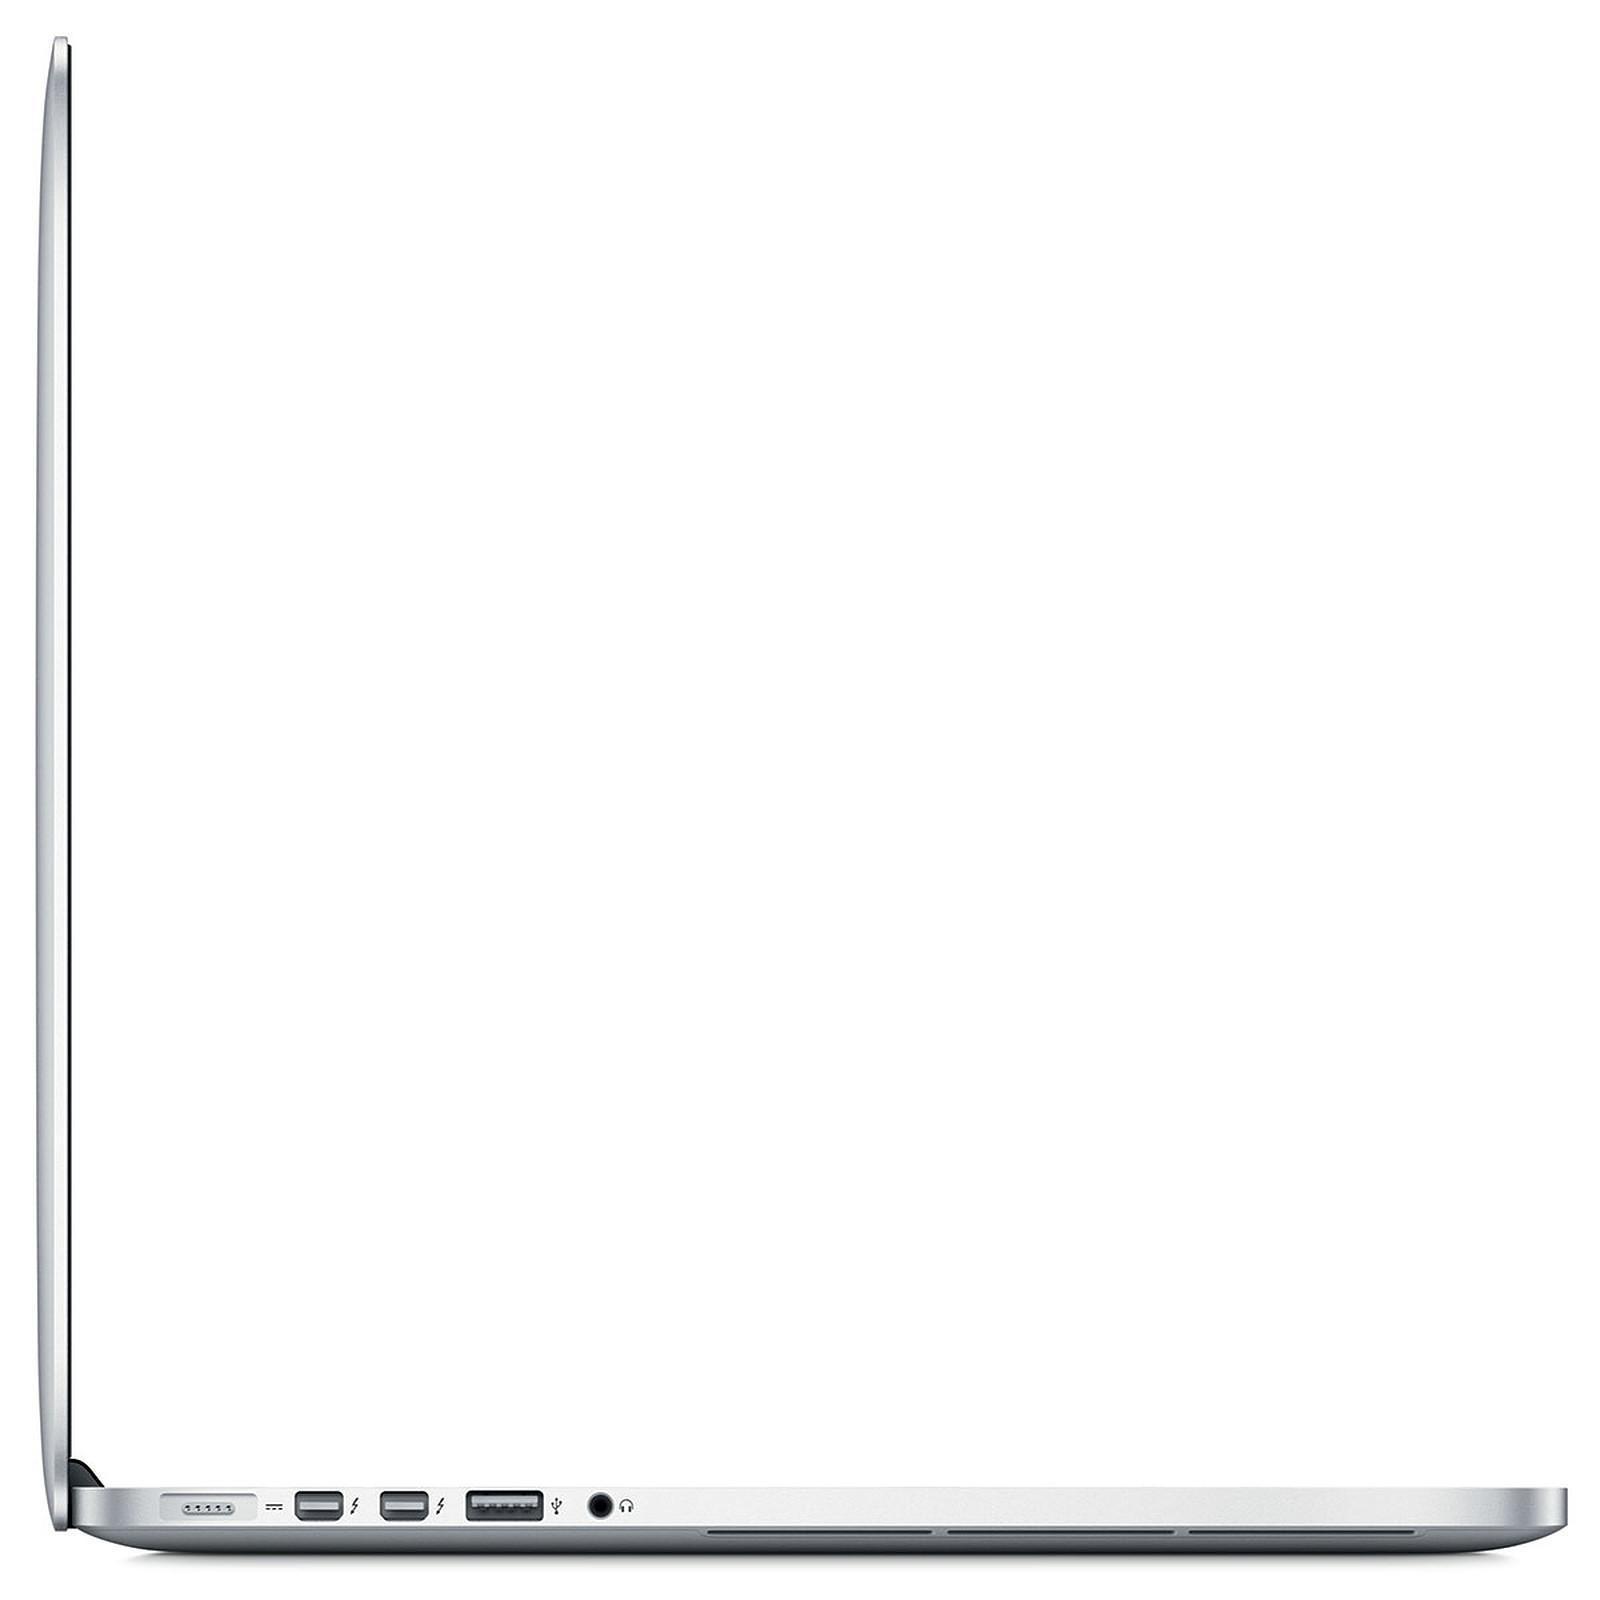 "MacBook Pro 15"" Retina (2015) - Core i7 2,2 GHz - SSD 256 GB - 16GB - AZERTY - Frans"